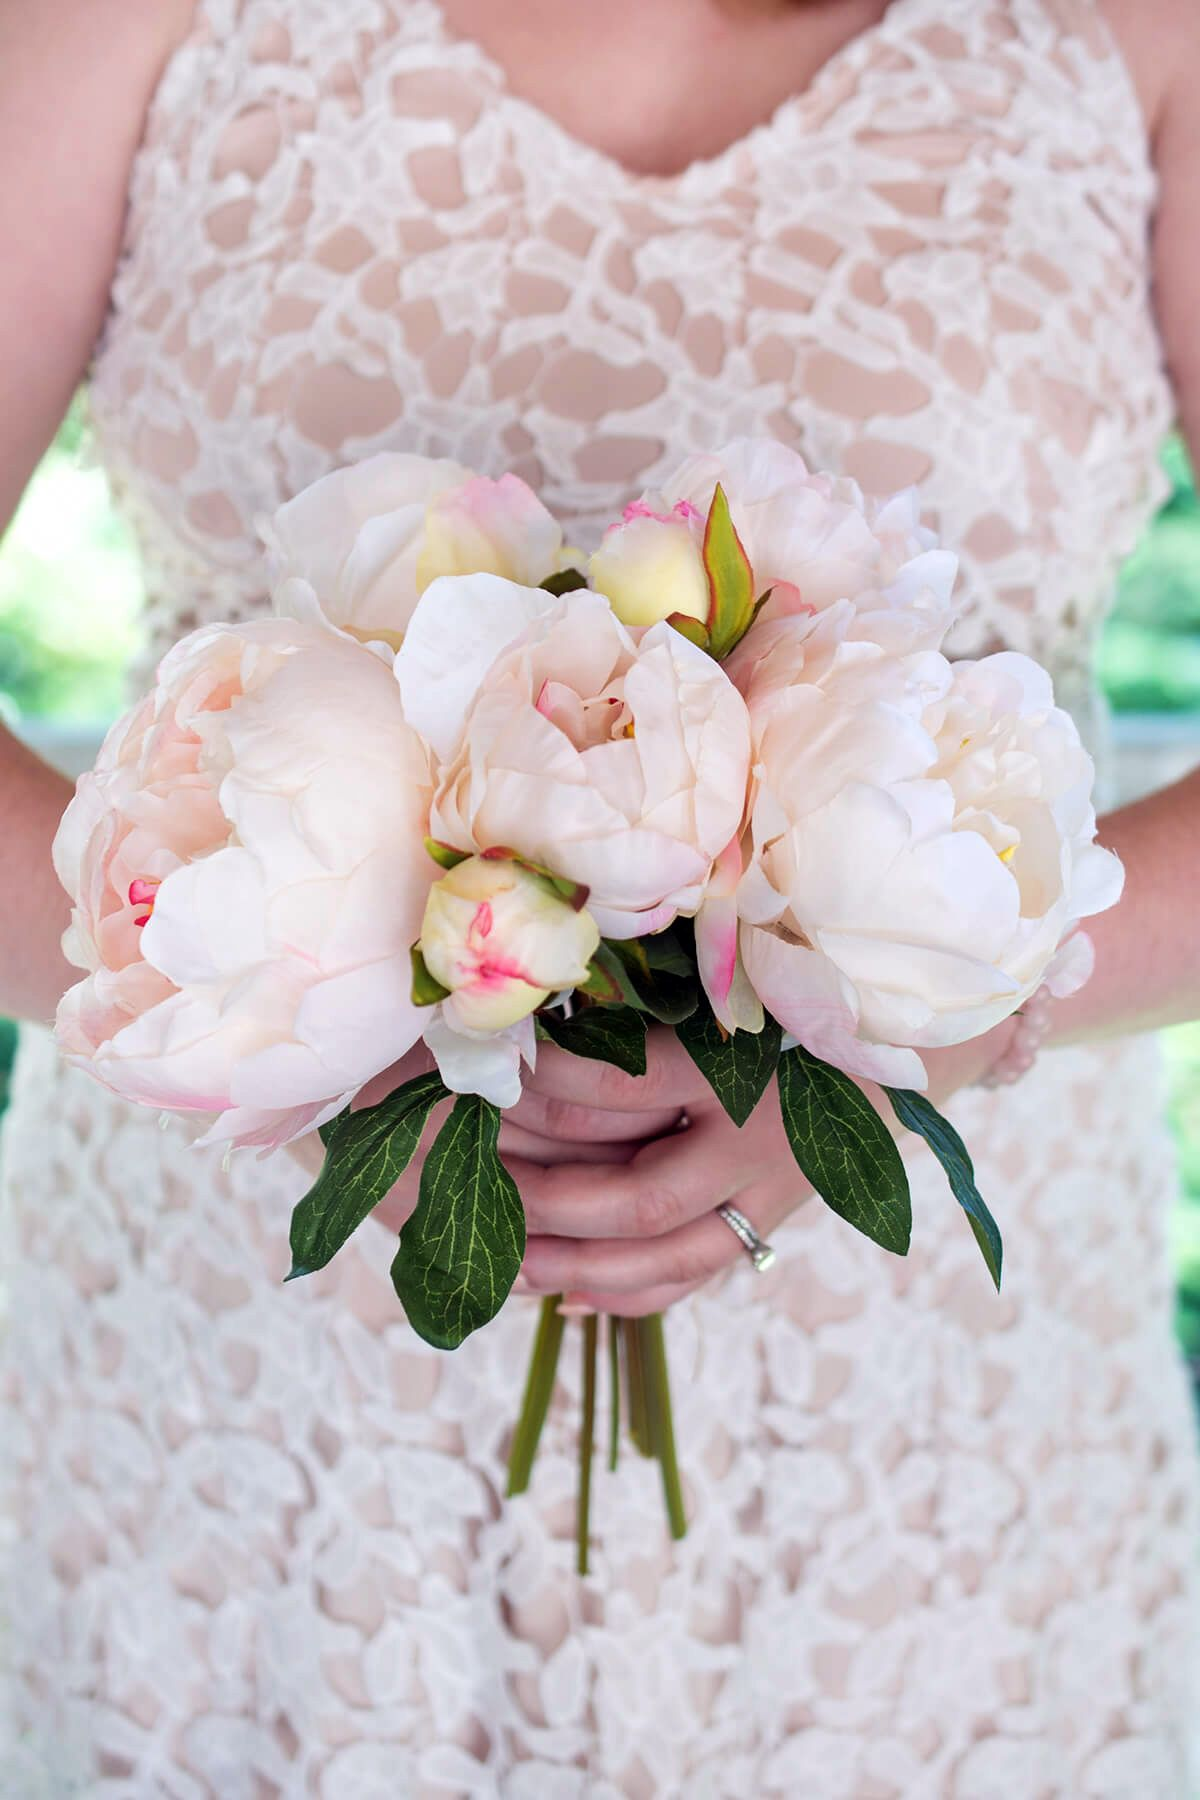 Peony bouquet silk cream flowers wedding ideas pinterest peony bouquet silk cream flowers wedding ideas pinterest bouquet peonies bouquet and flowers izmirmasajfo